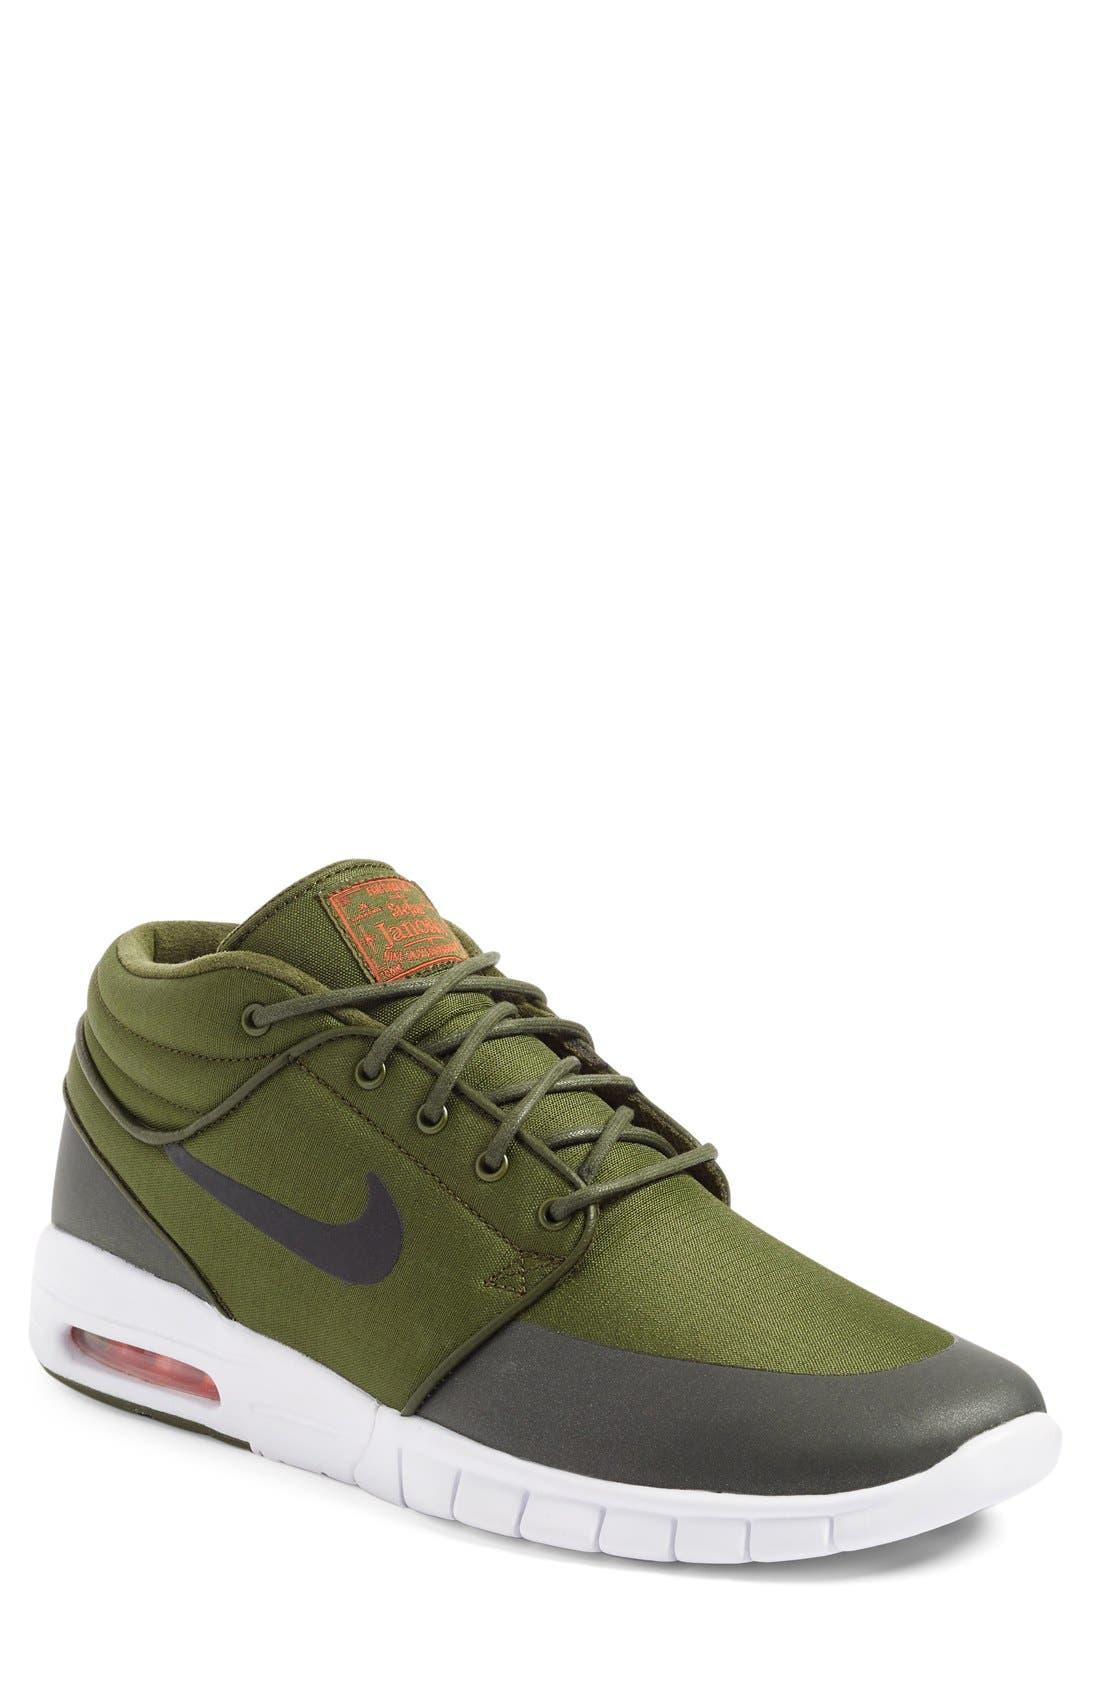 wholesale dealer 097e8 8cba5 ... clearance main image nike sb stefan janoski max mid skate shoe men  a35c0 96175